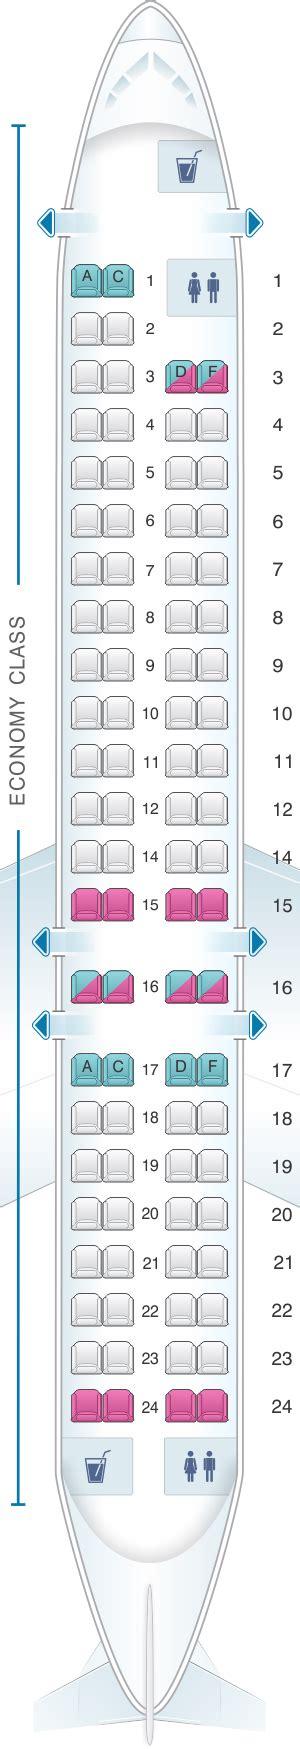 canadair regional jet seating seat map scandinavian airlines sas bombardier canadair